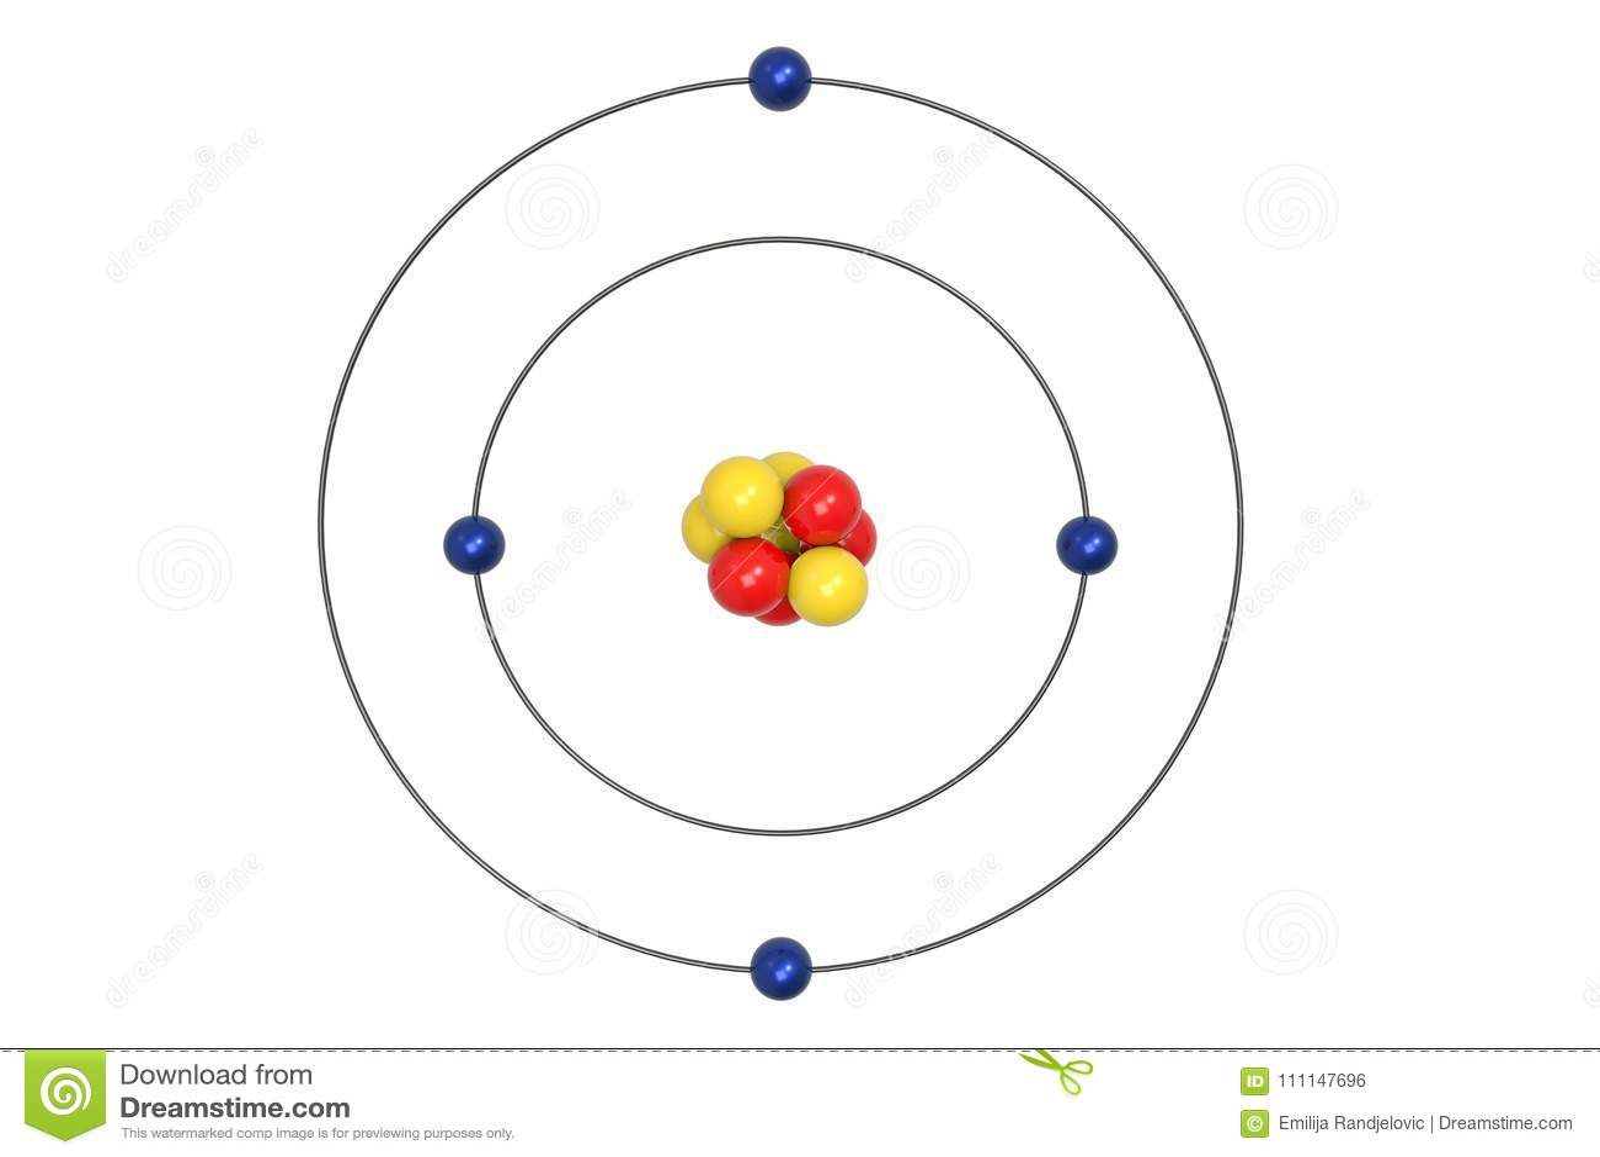 Beryllium Atom Bohr Model With Proton Neutron And